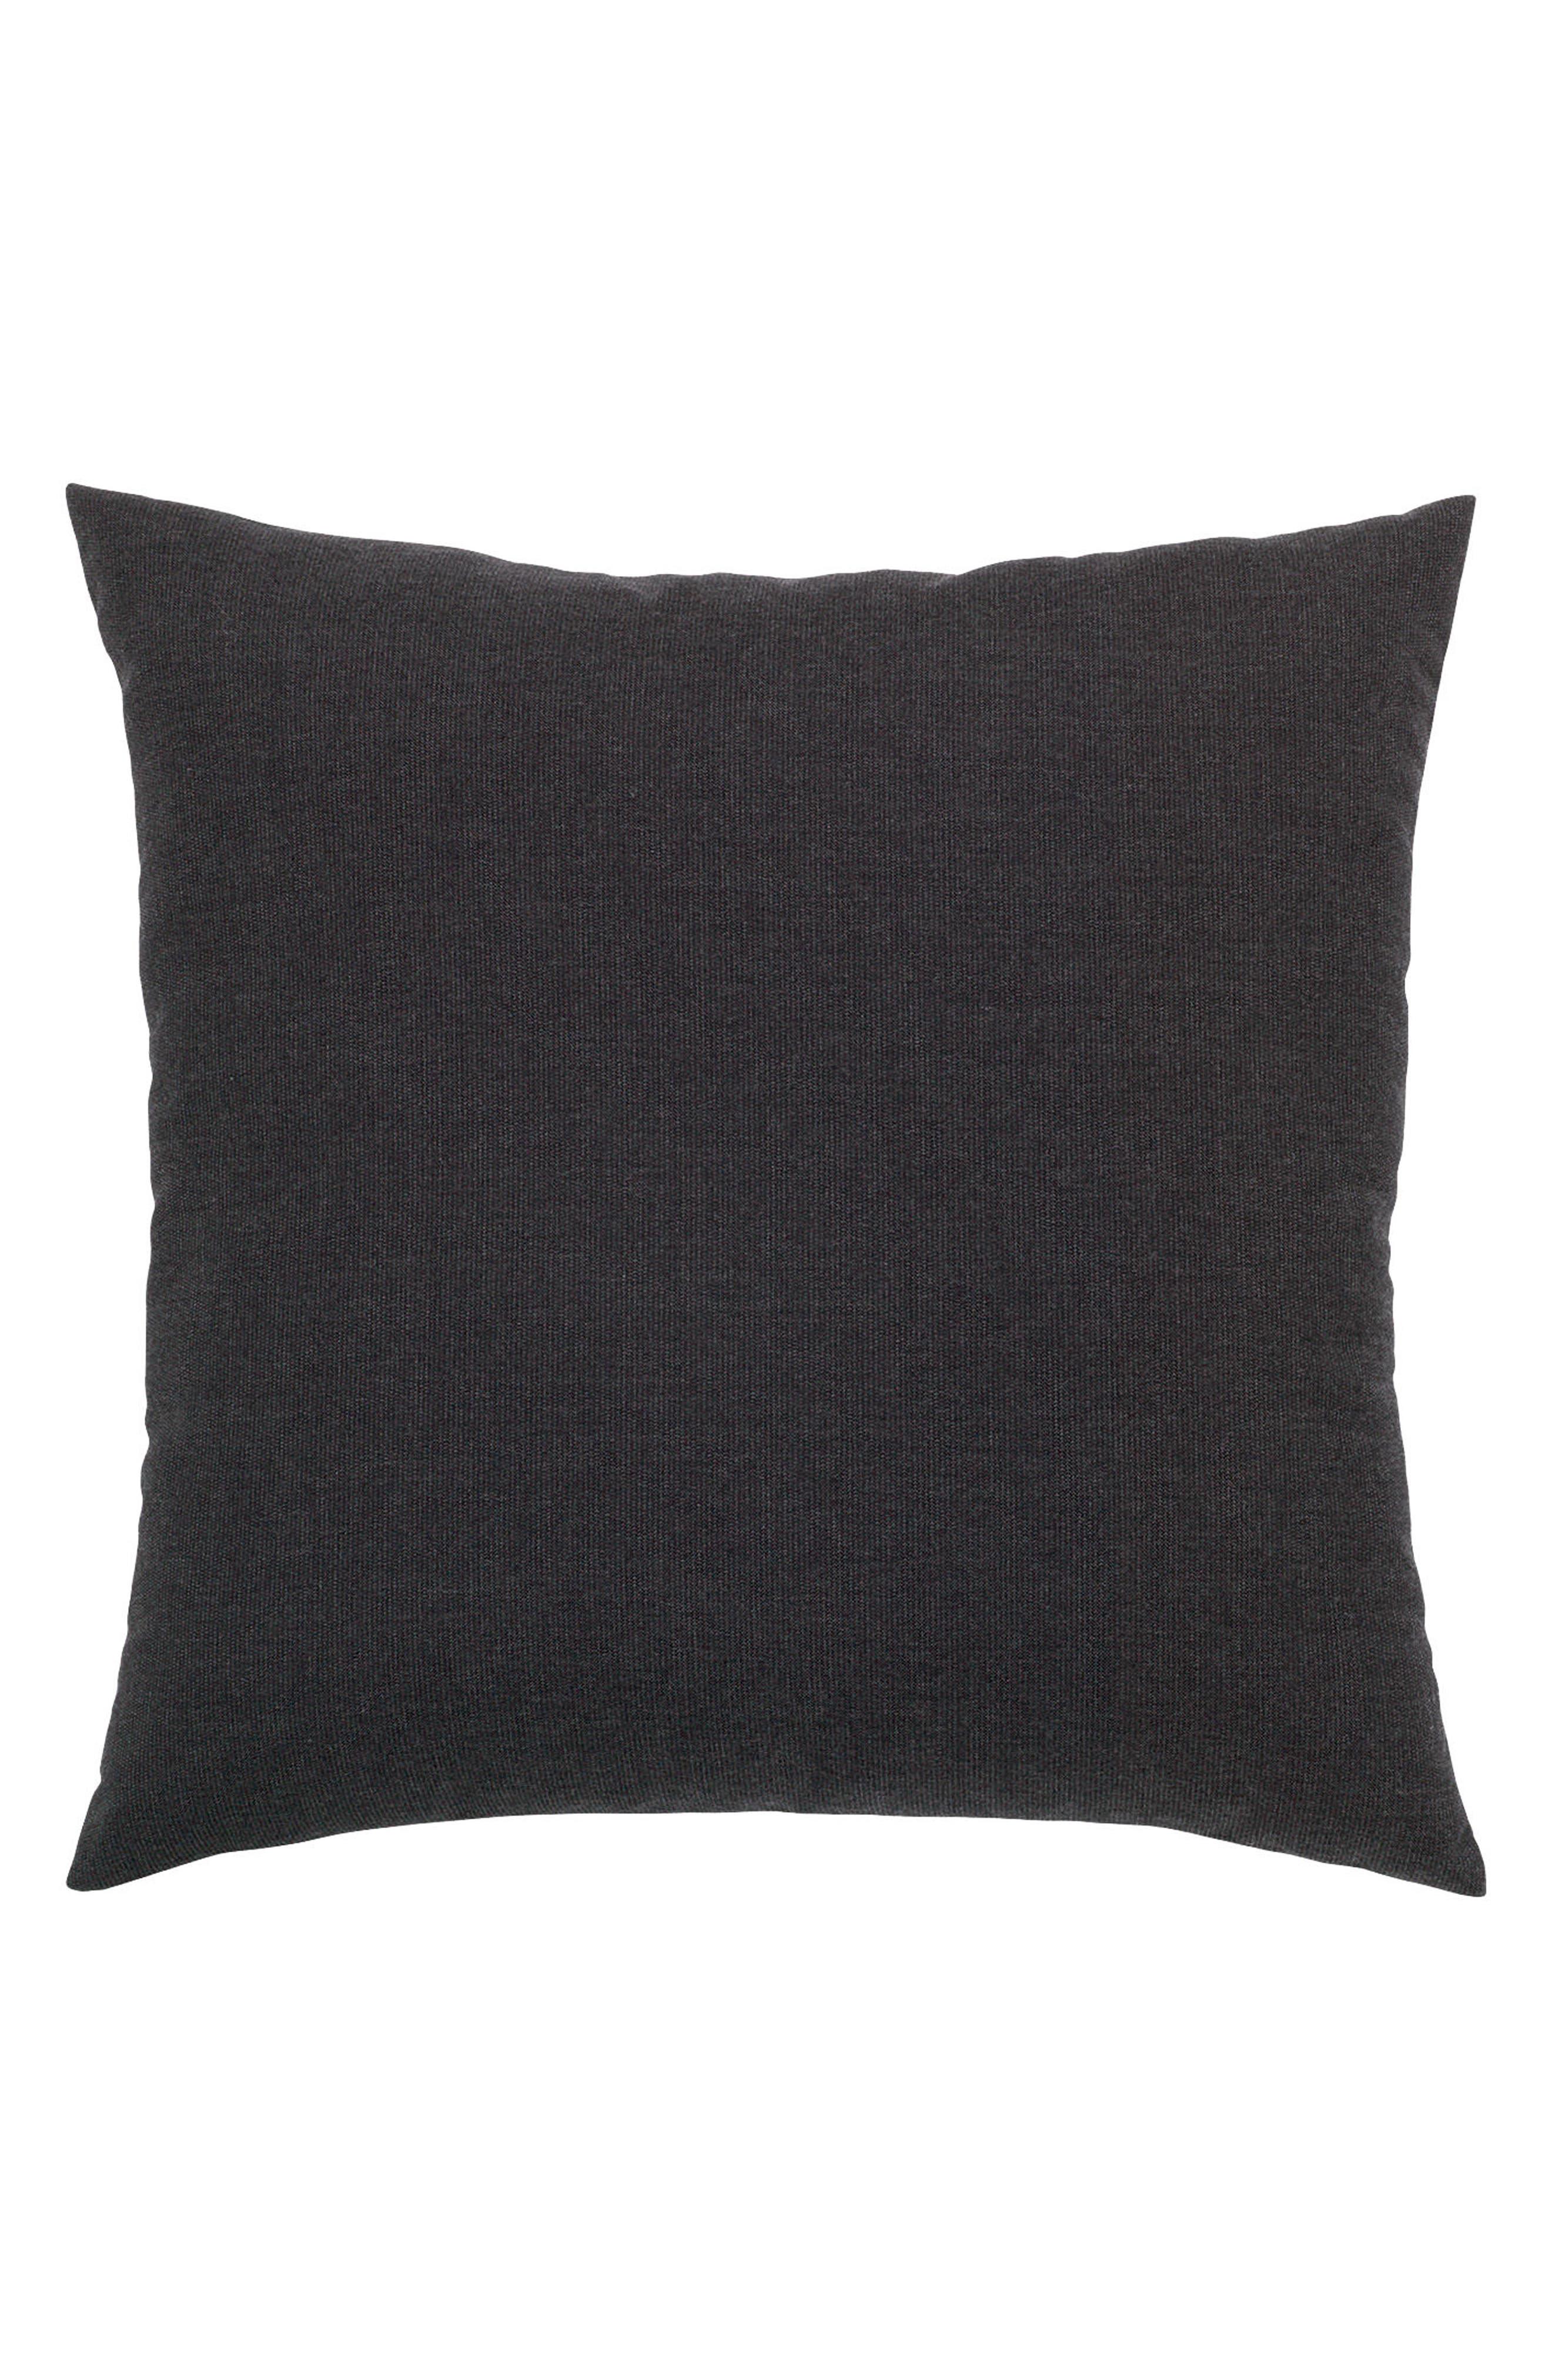 Golden Deco Indoor/Outdoor Accent Pillow,                             Alternate thumbnail 2, color,                             BLACK MULTI